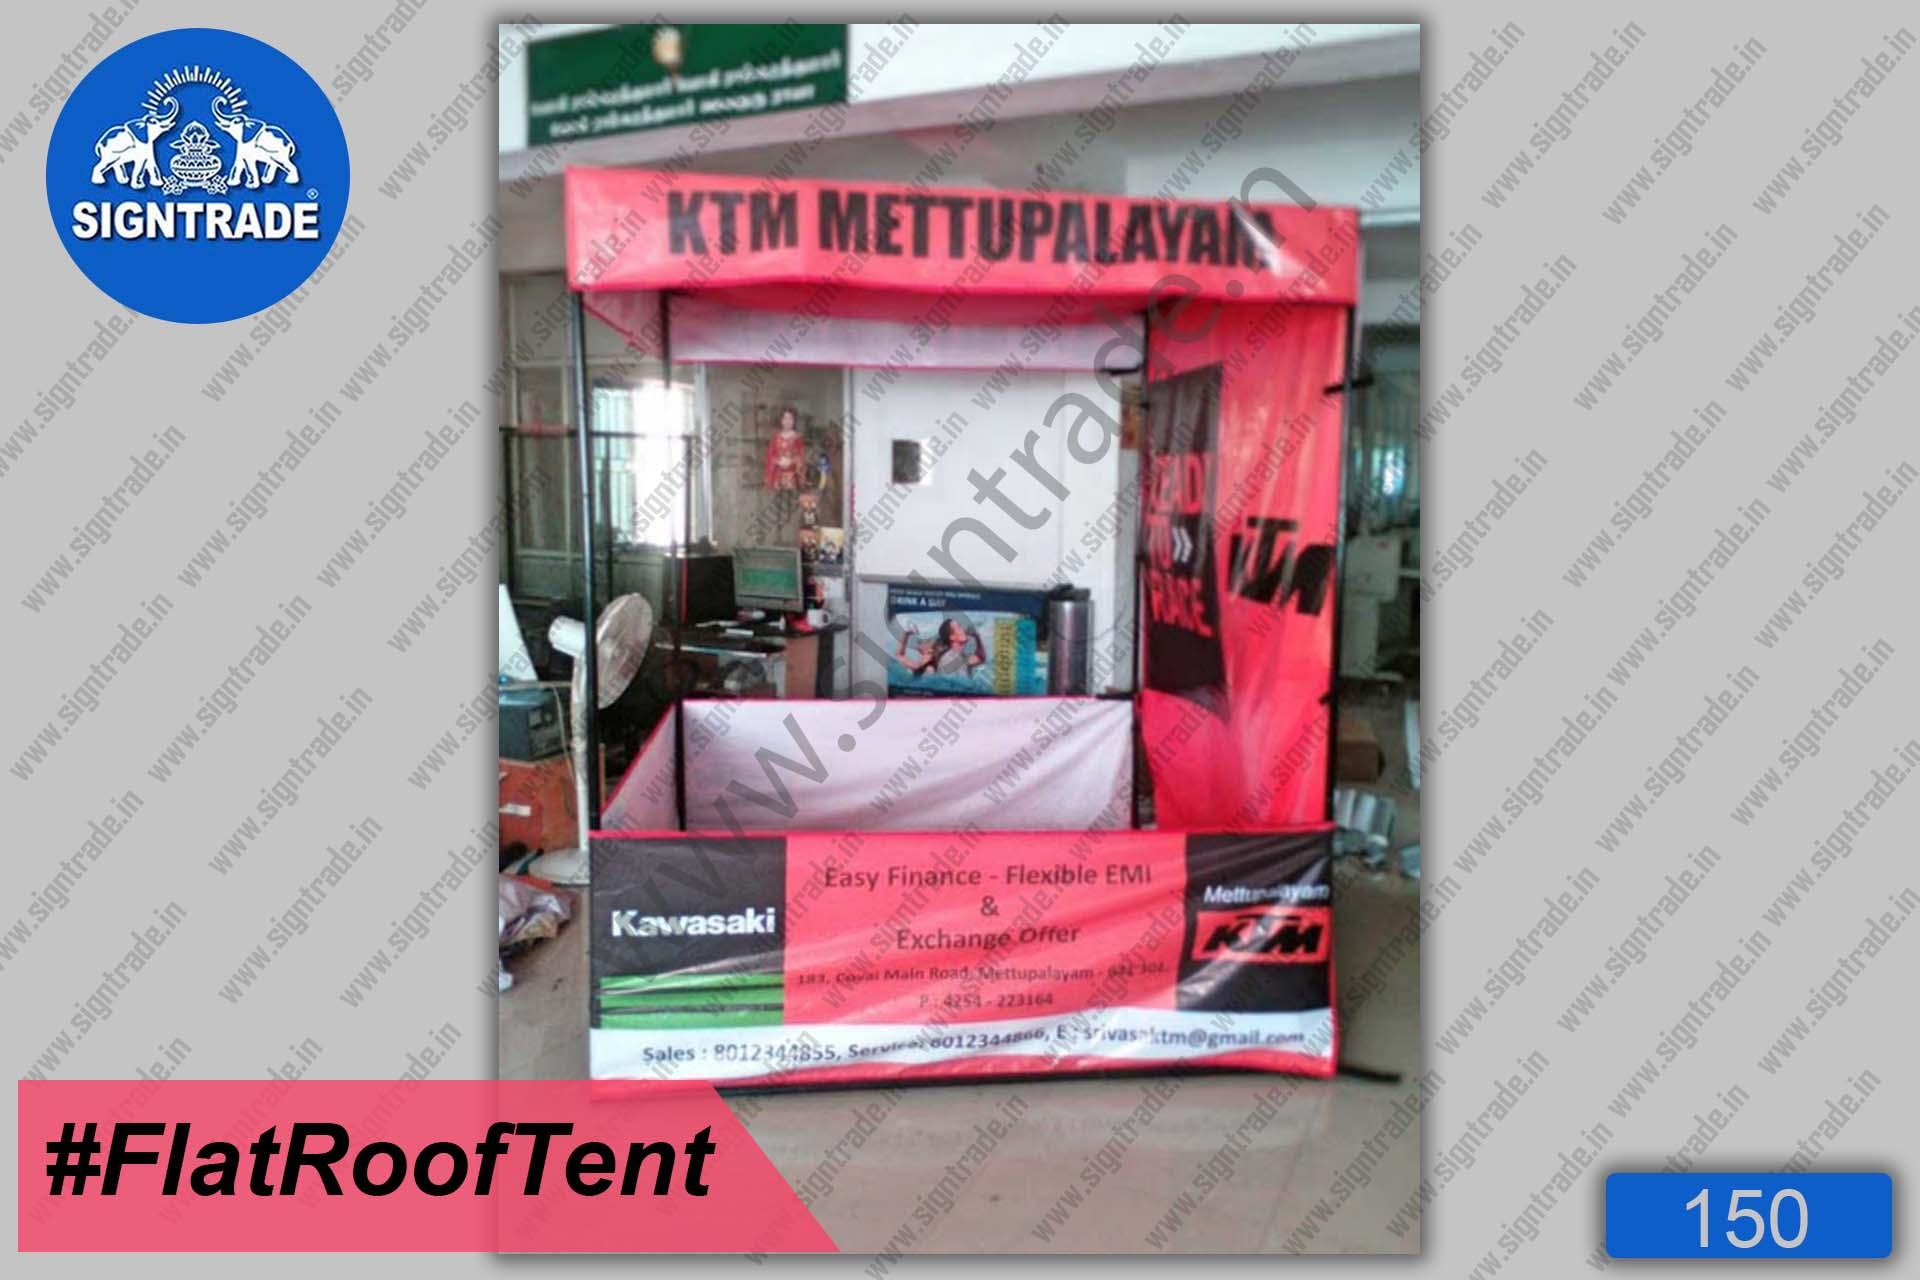 KTM - Canopy Tent